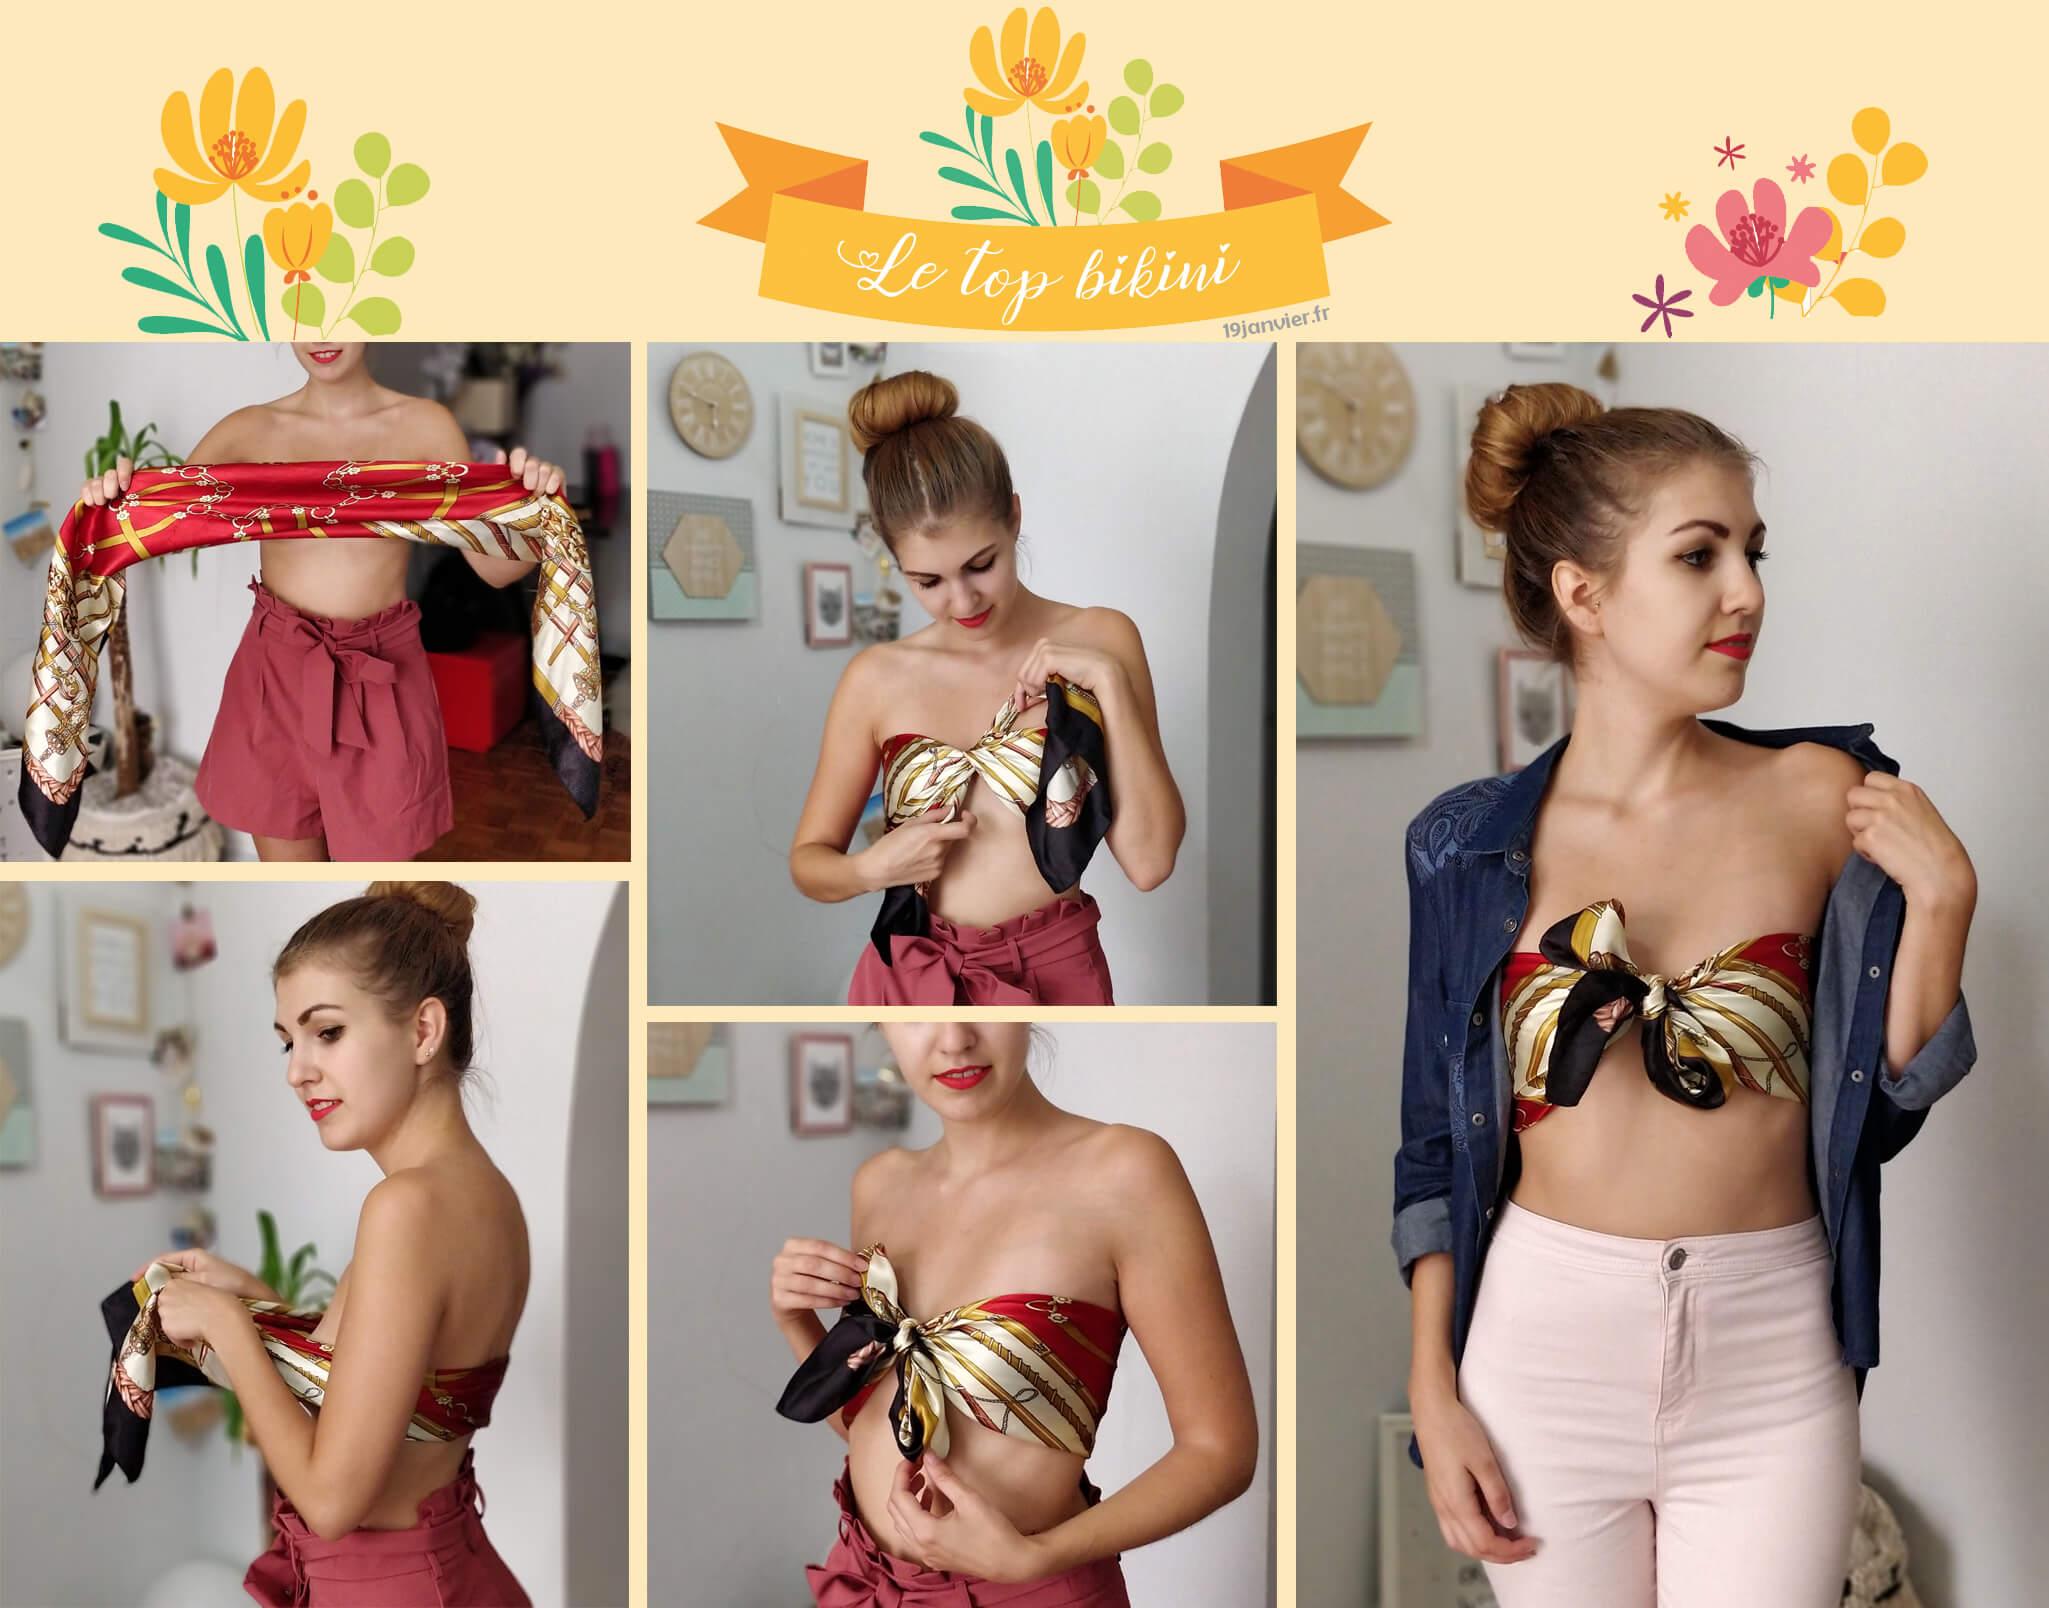 top bikini noeud foulard tutoriel - Que faire avec un carré de soie ?